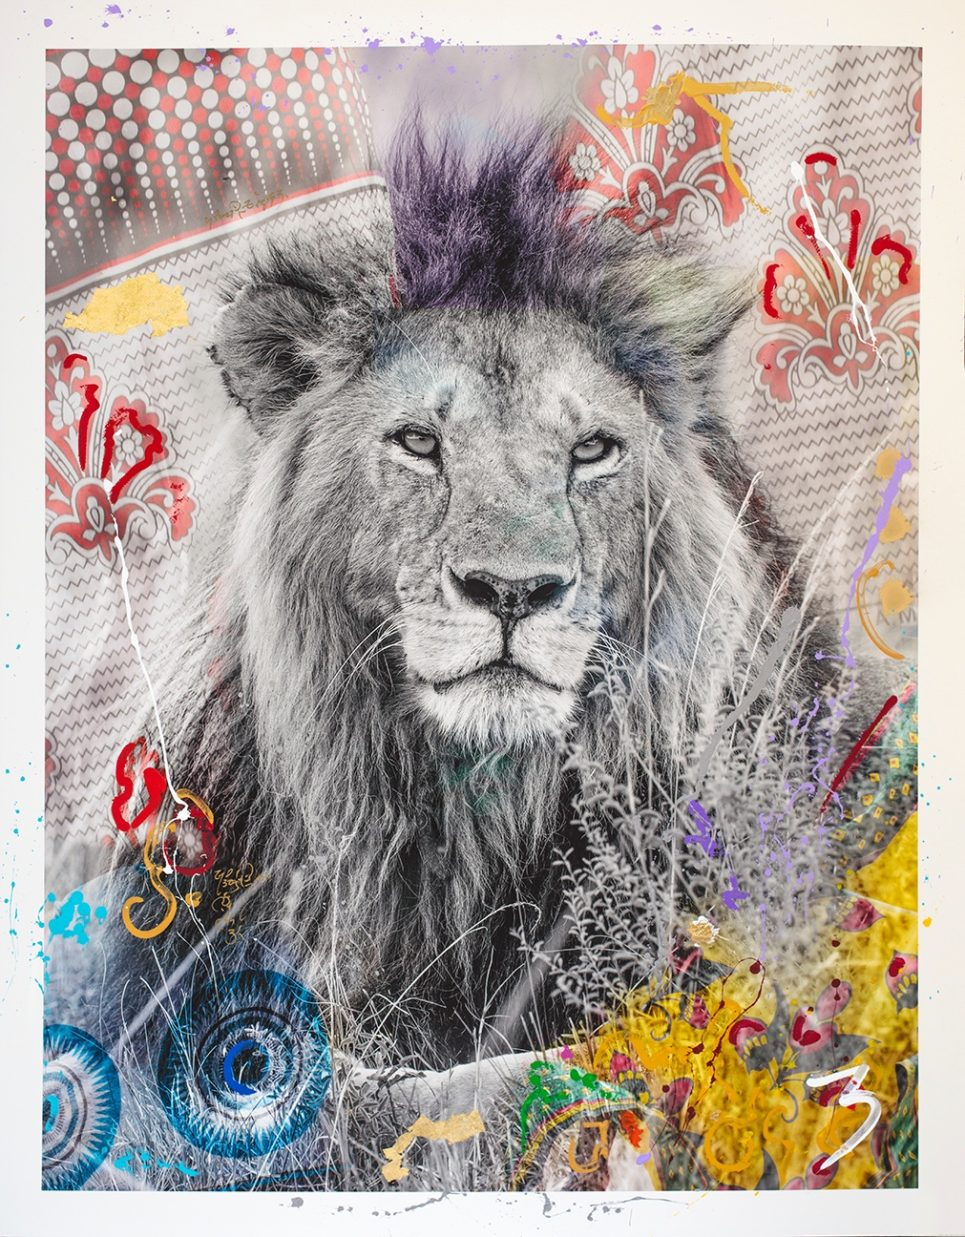 leone by arno elias